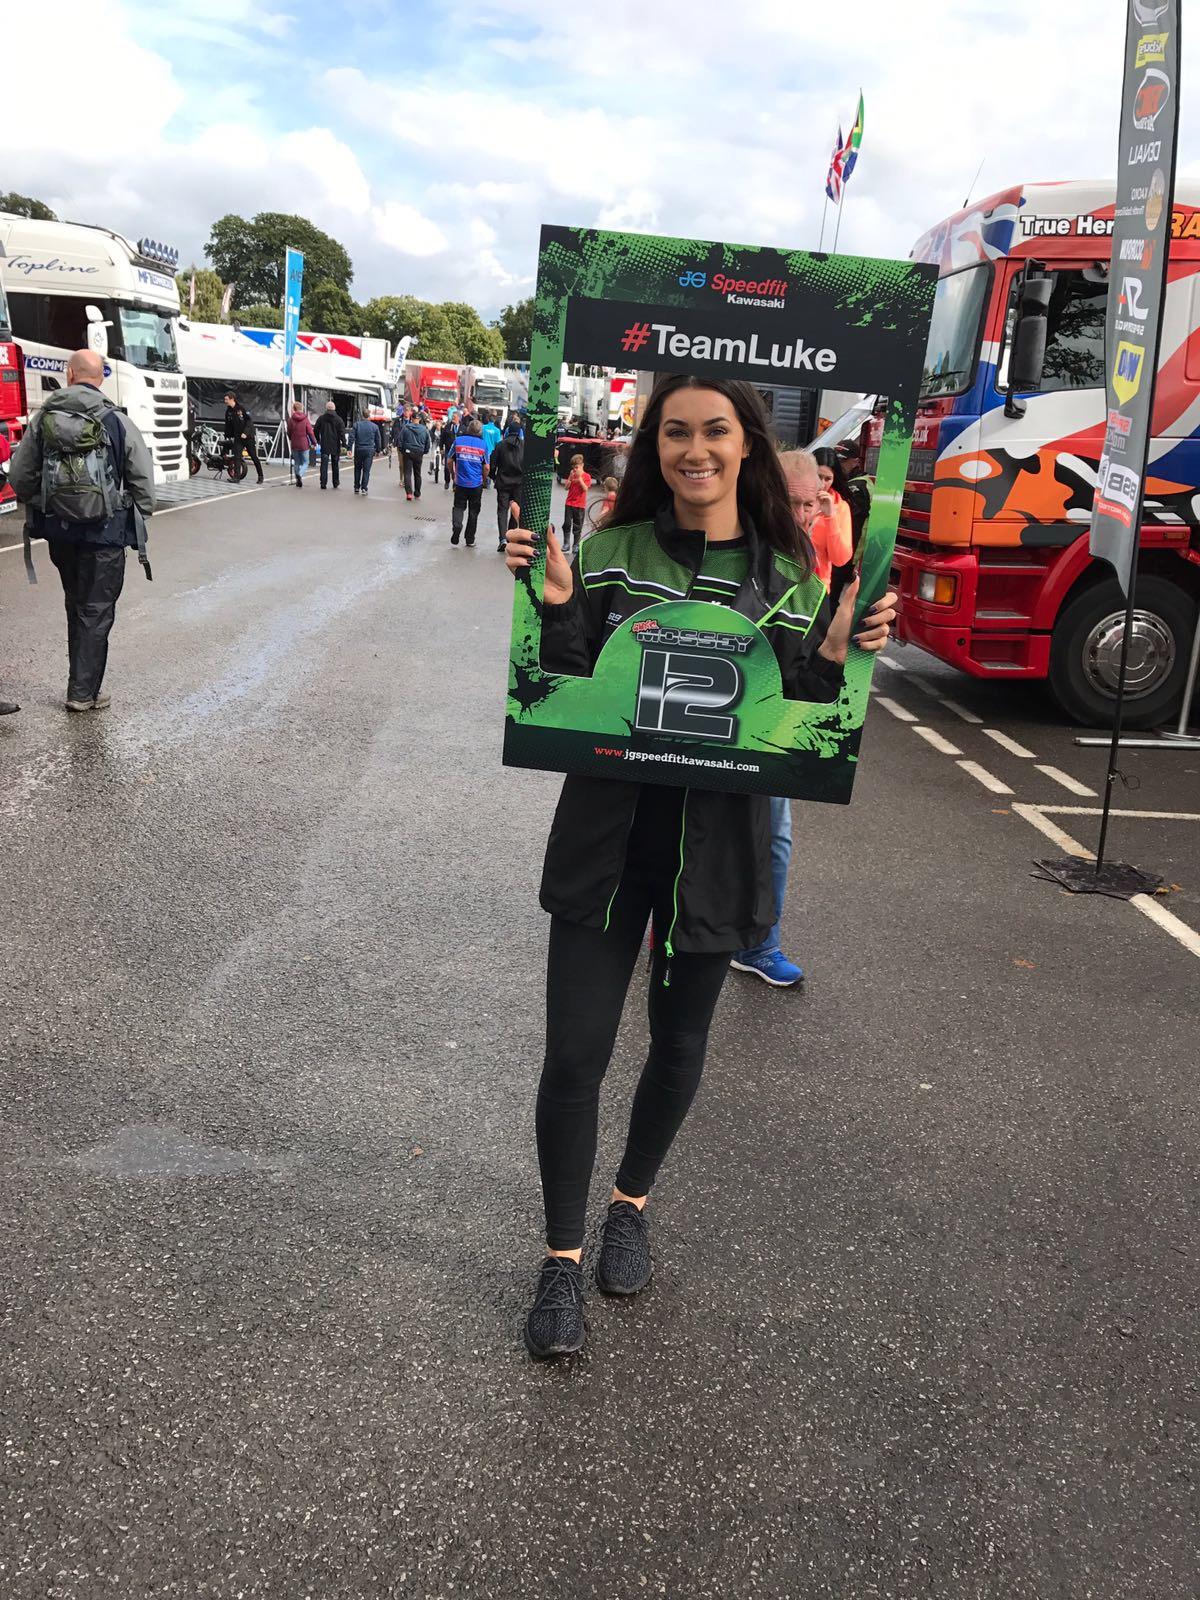 JG Speedfit Kawasaki Promo at Oulton Park – 16/17th September